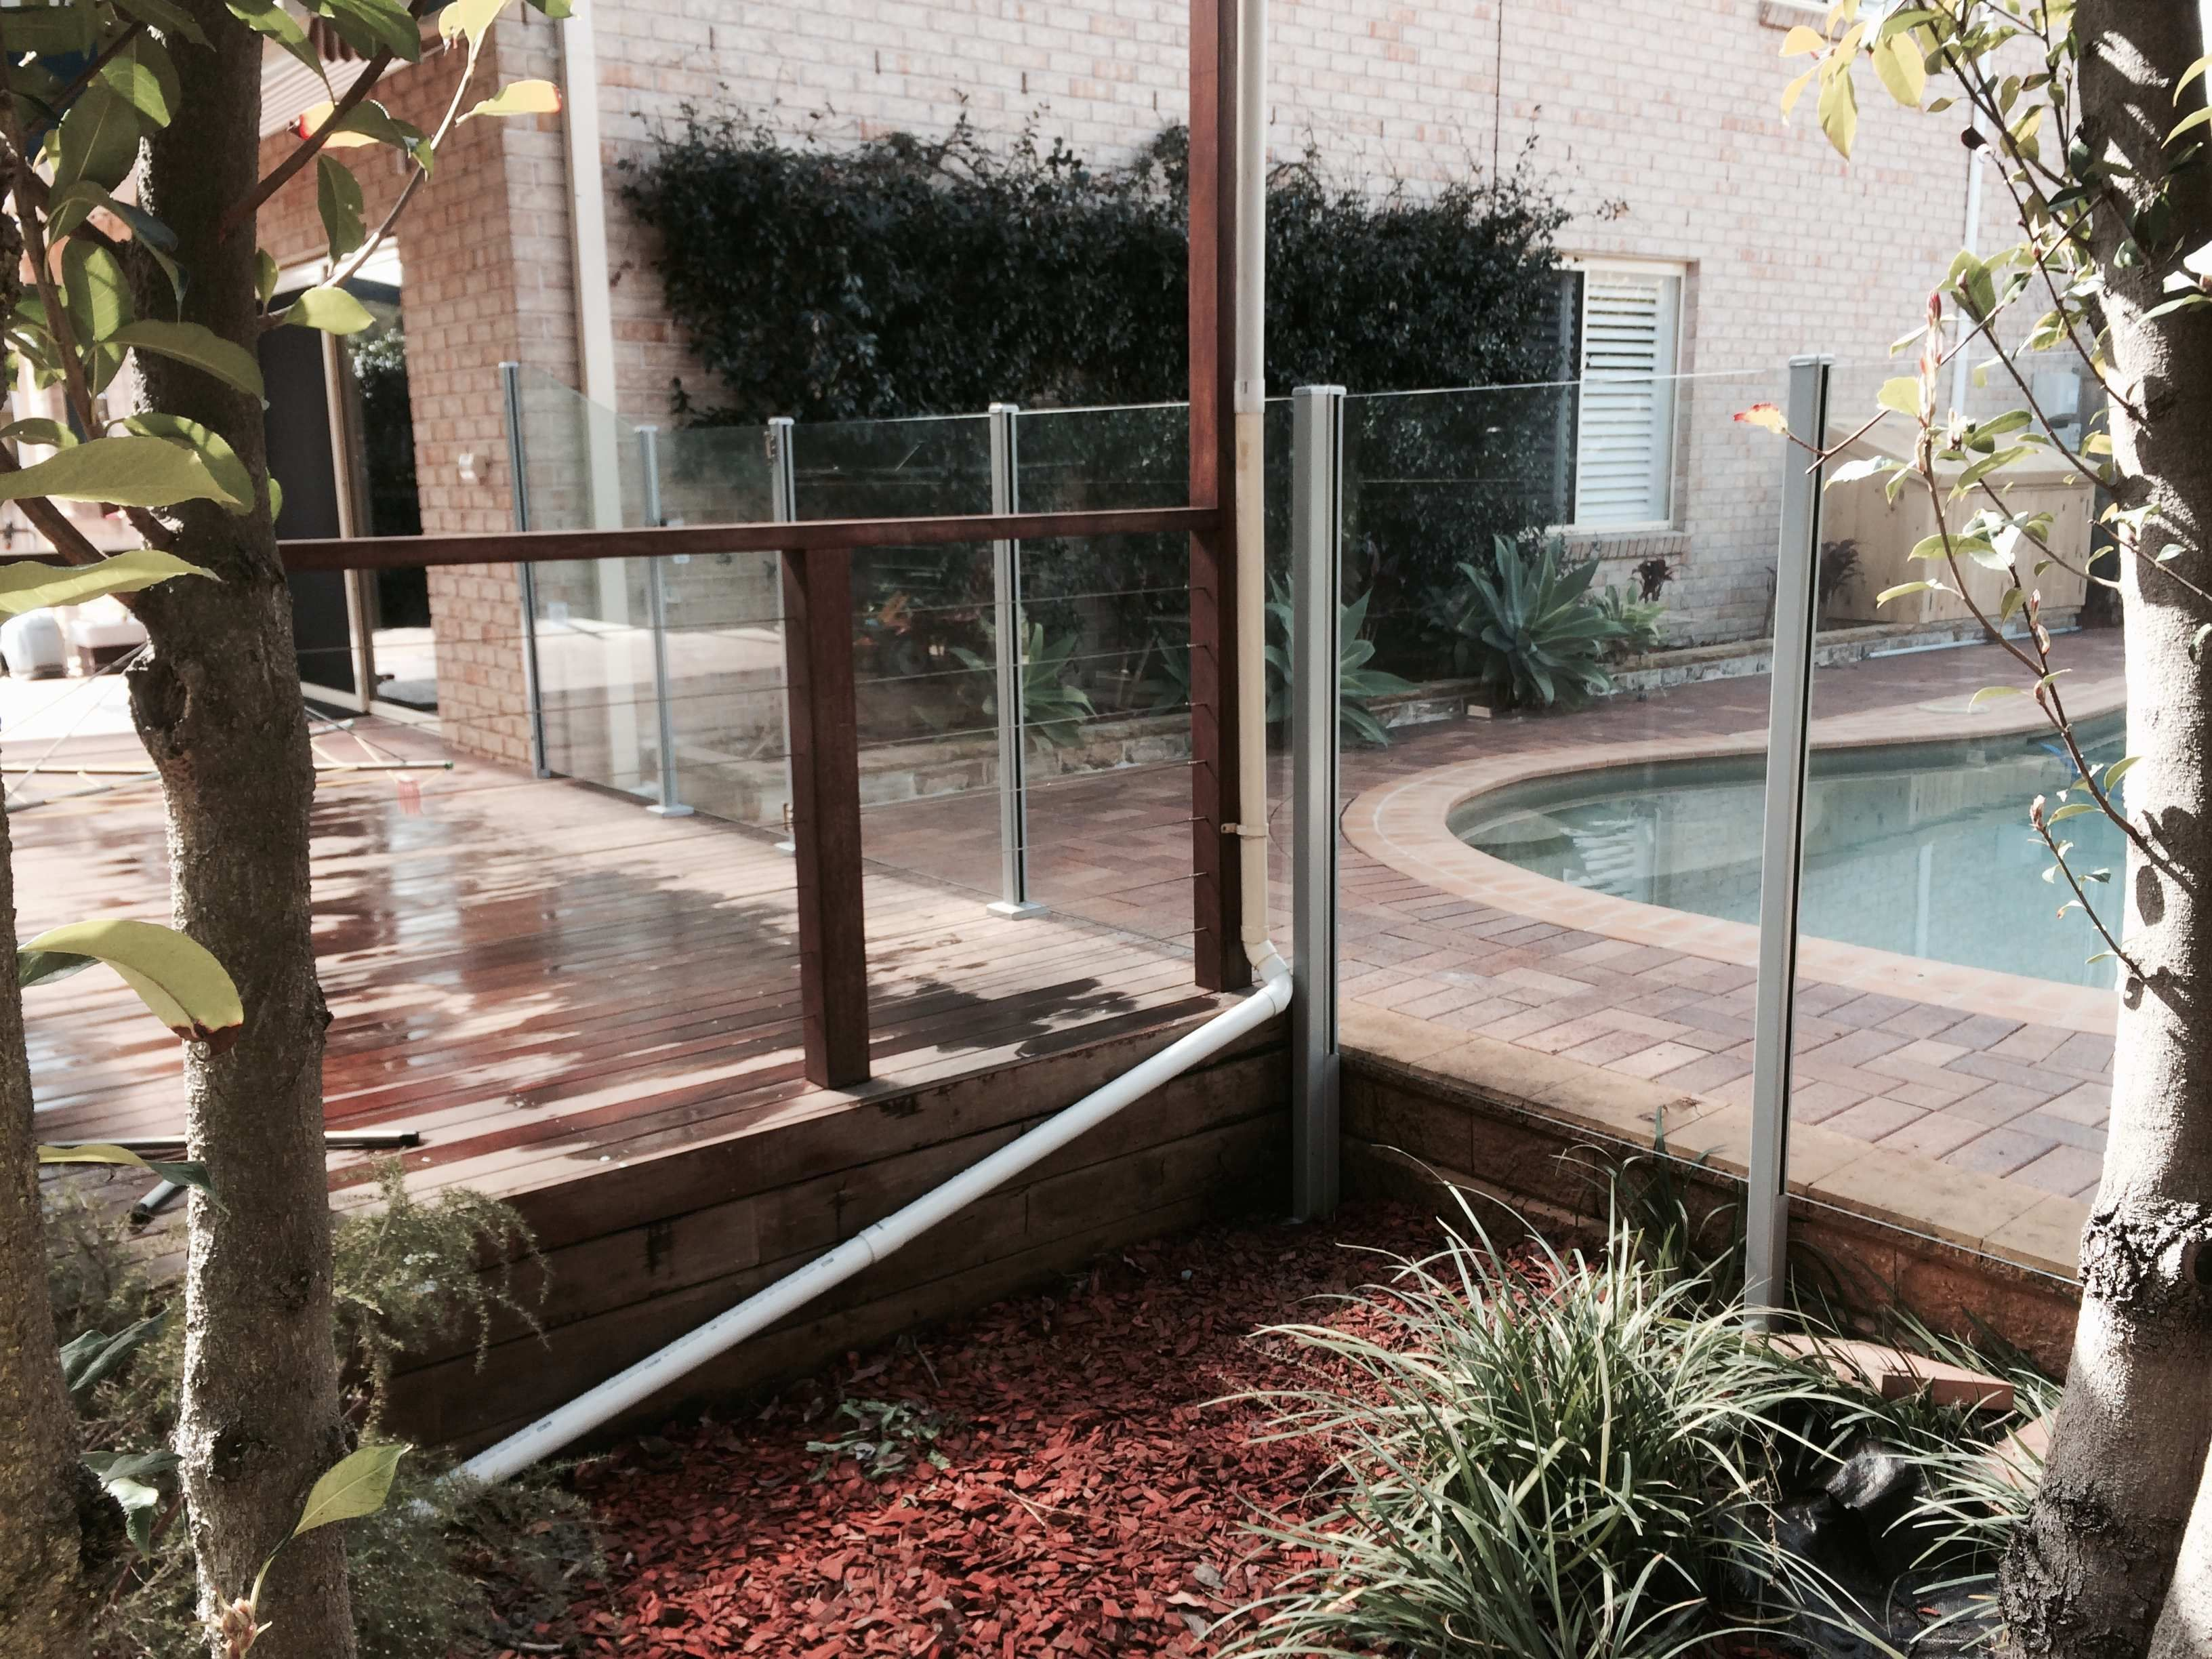 Semi Frameless Glass Pool Fence - 006 semi frameless glass pool fence 50mm dia rnd glazing posts landscape pinterest glass pool fencing glass pool and glass